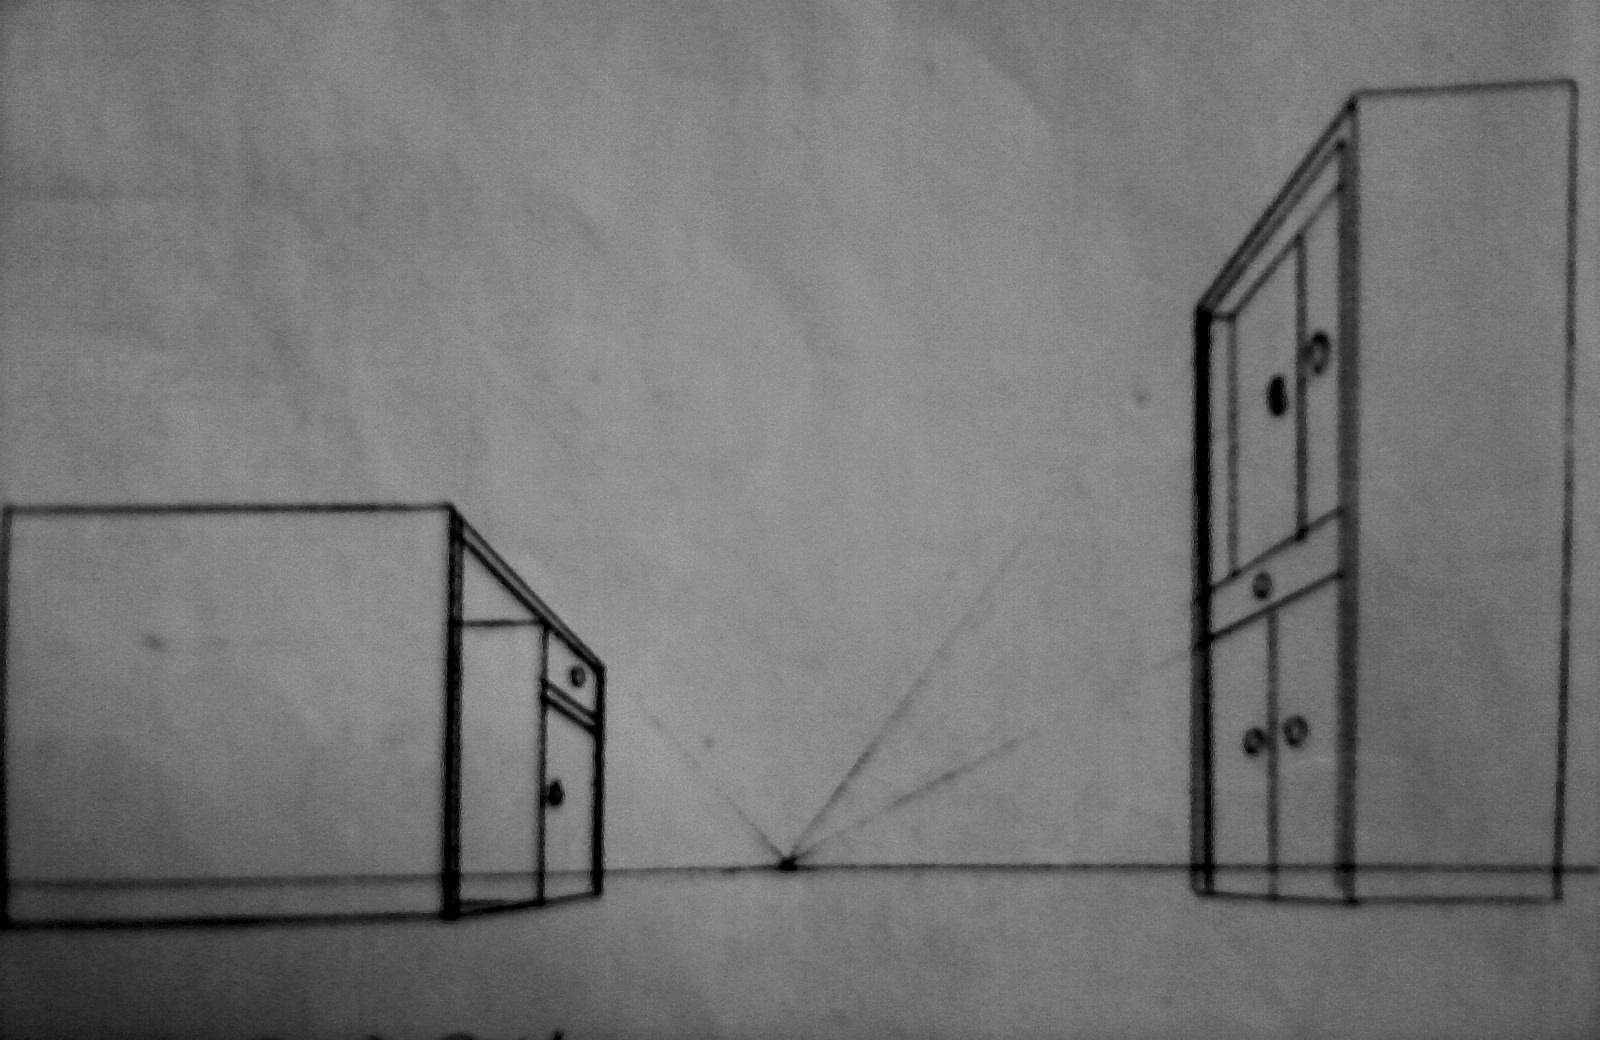 Prinsip Menggambar Bentuk Perspektif Faza Khilyala